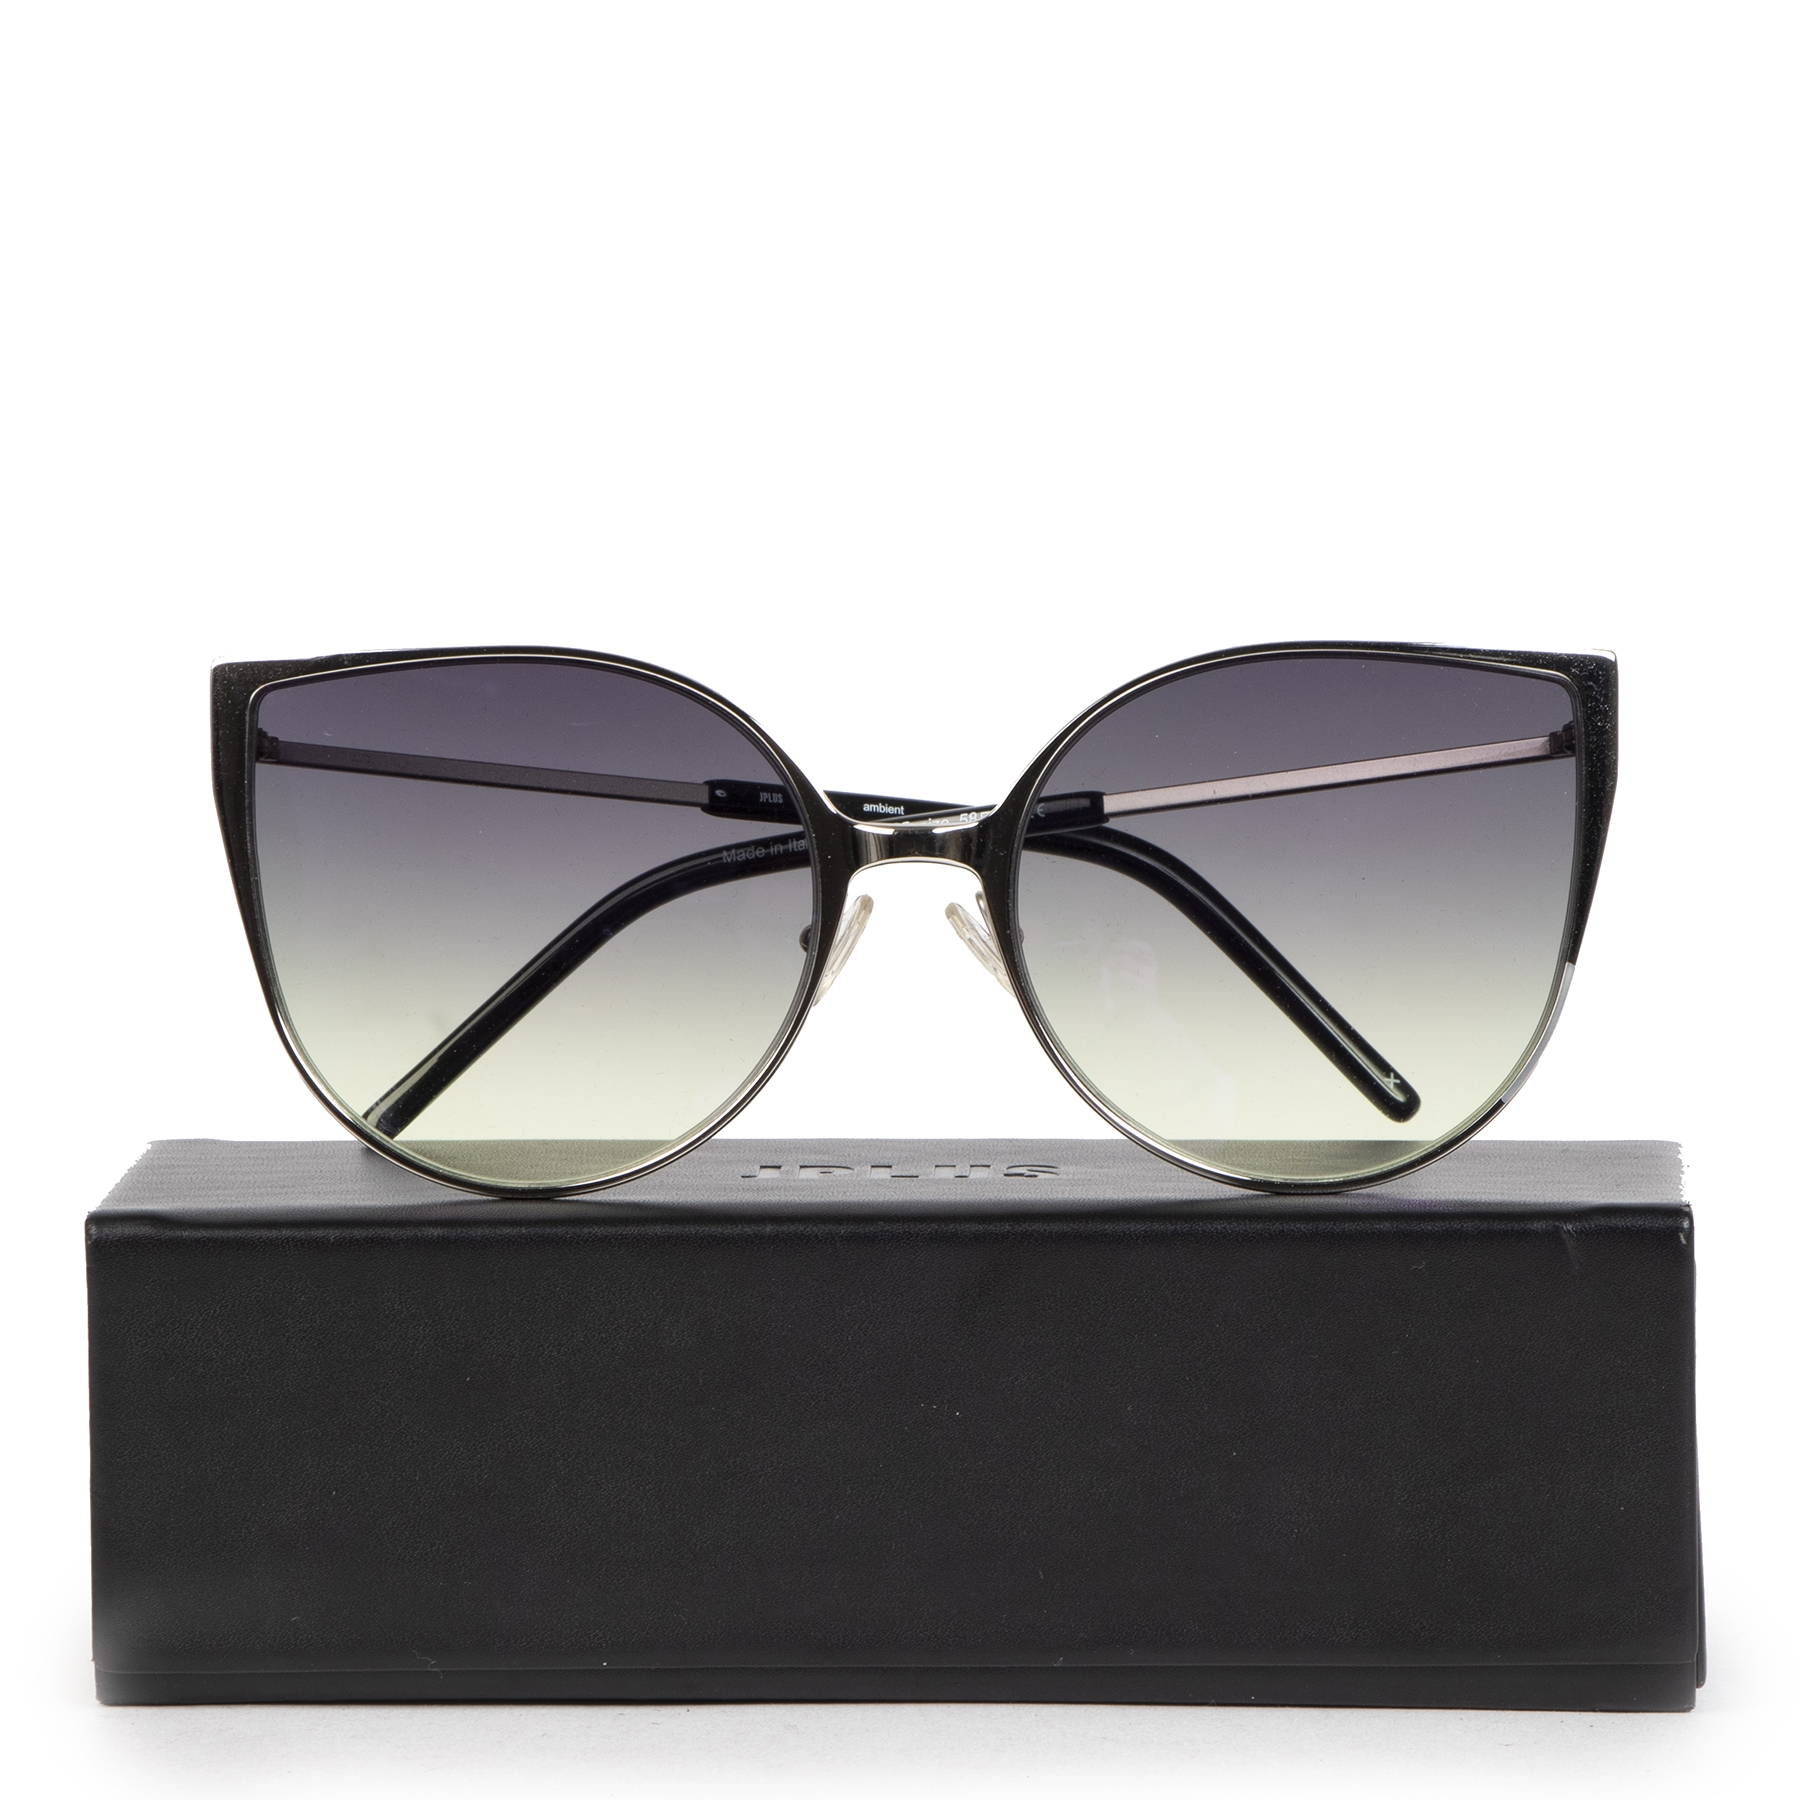 Authentic second-hand vintage Jplus Cateye Irridescent Sunglasses buy online webshop LabelLOV